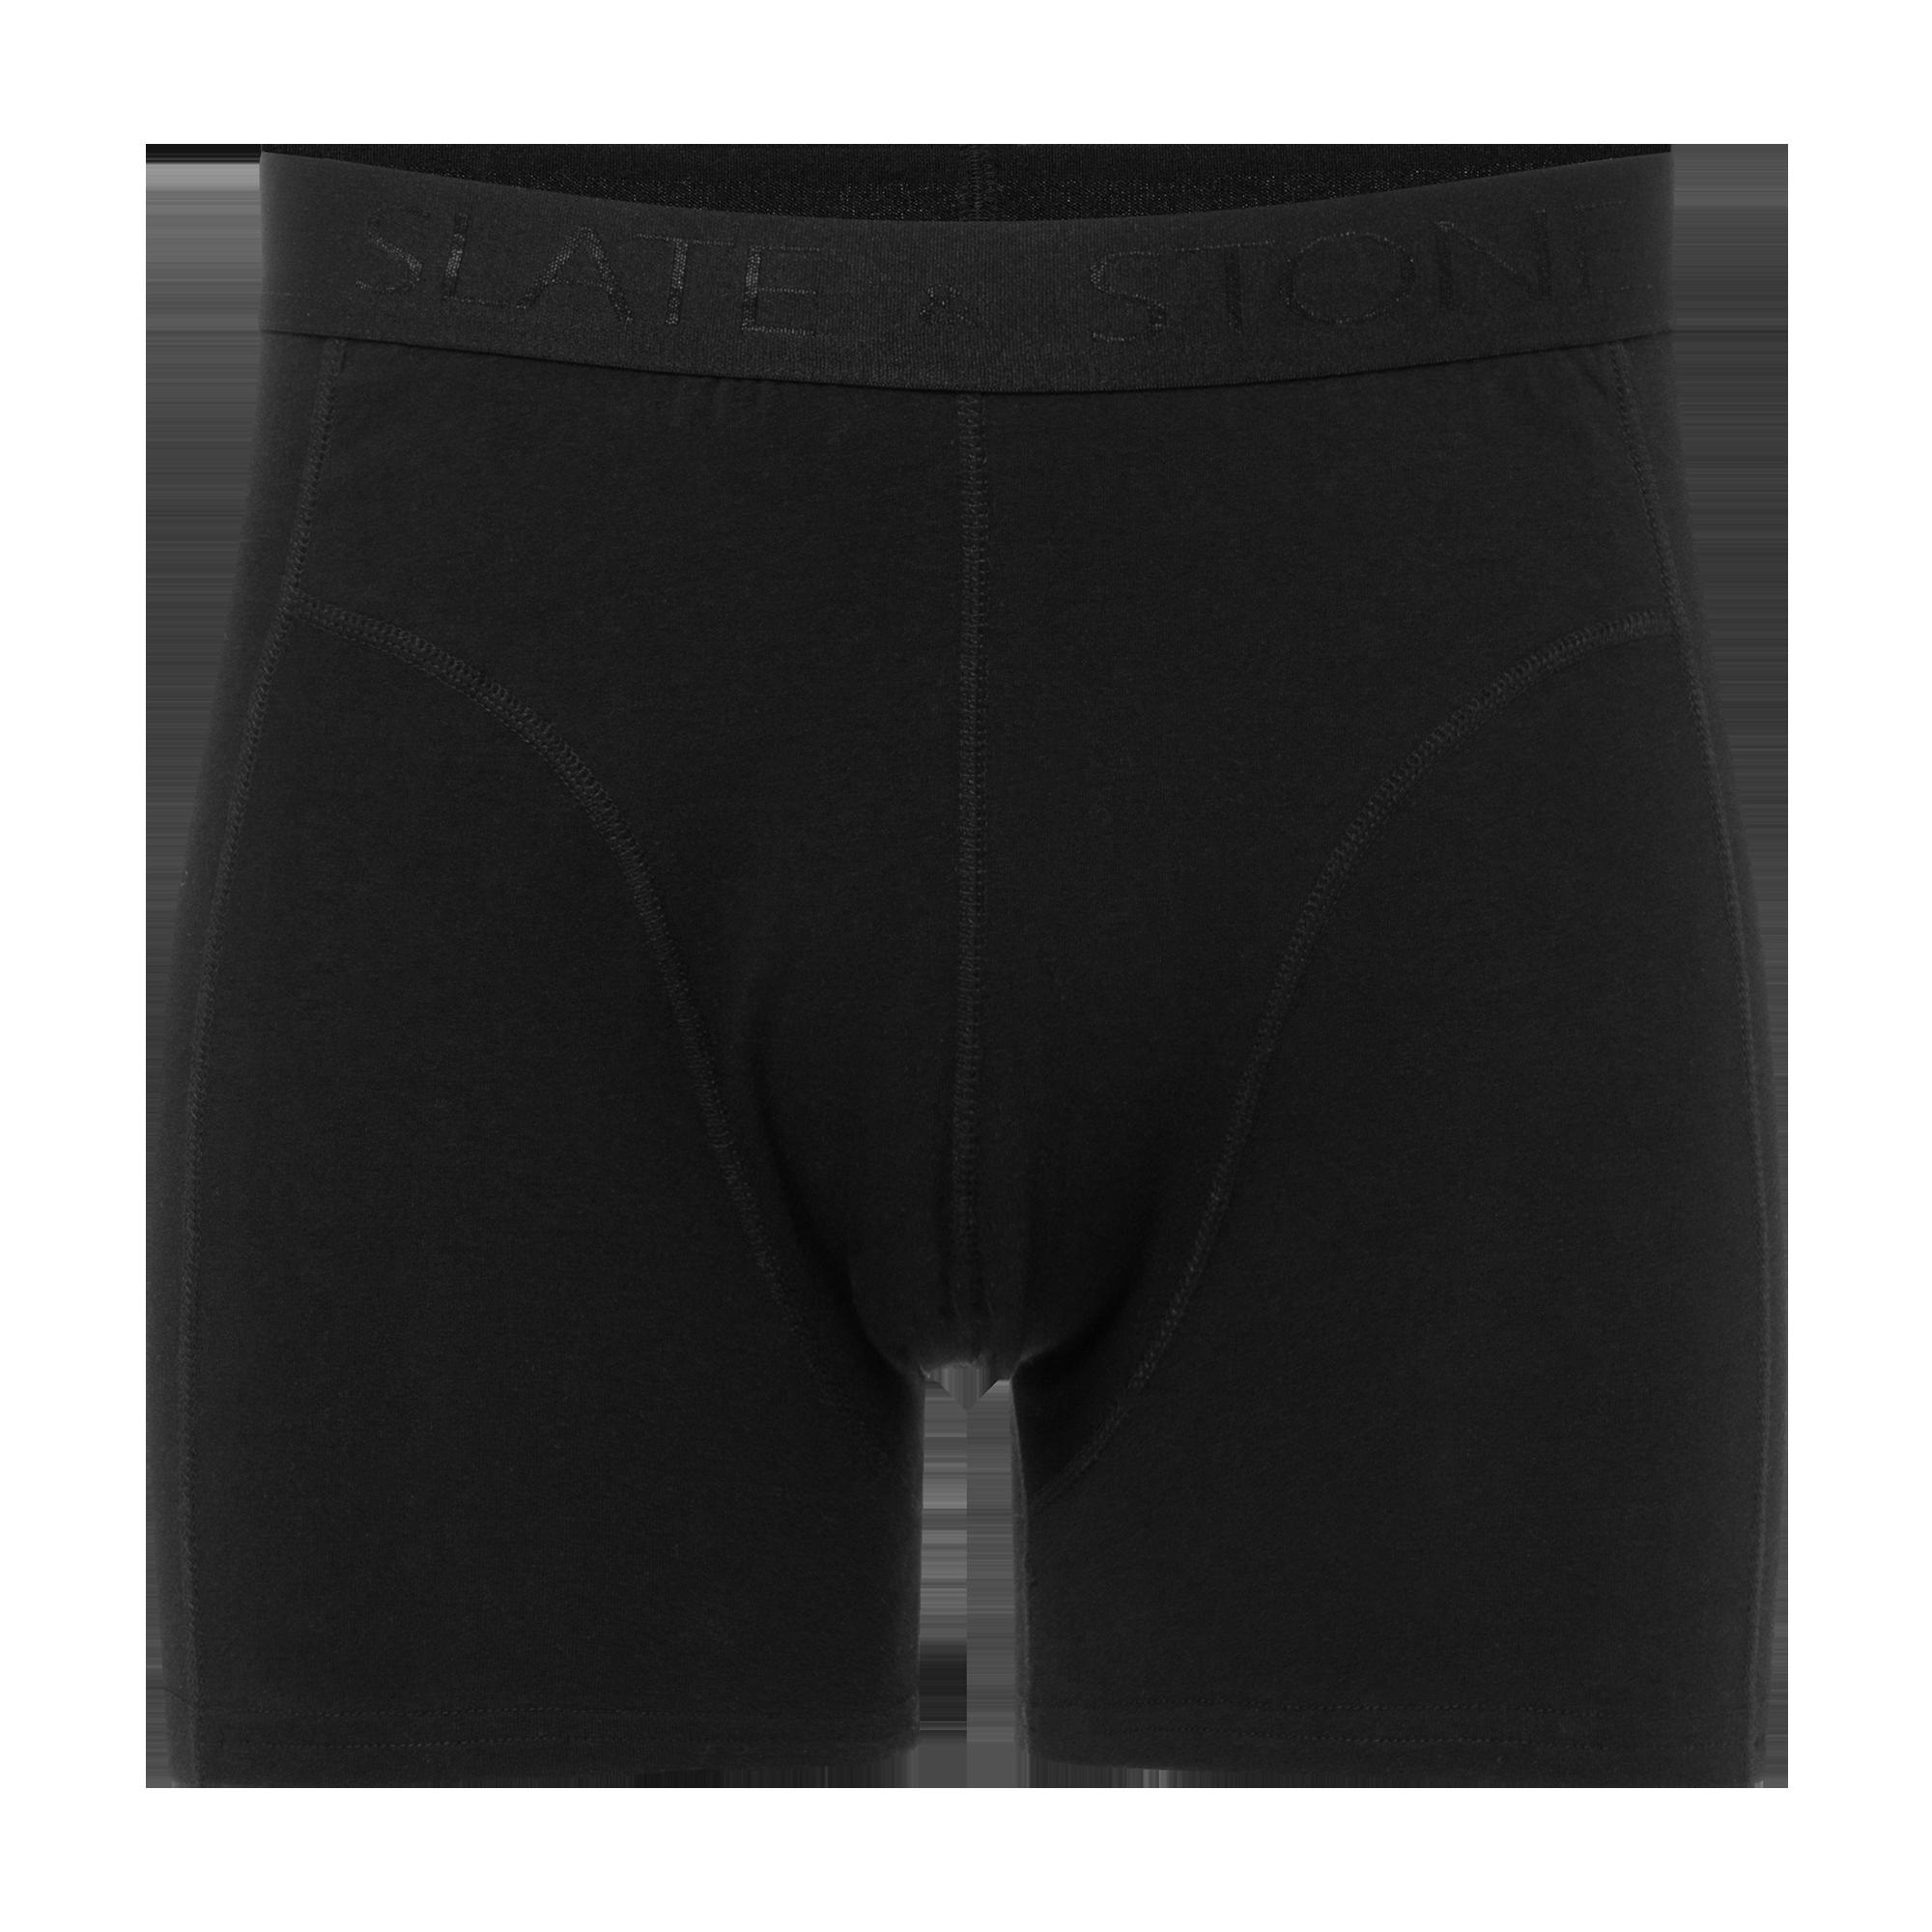 Underwear product image